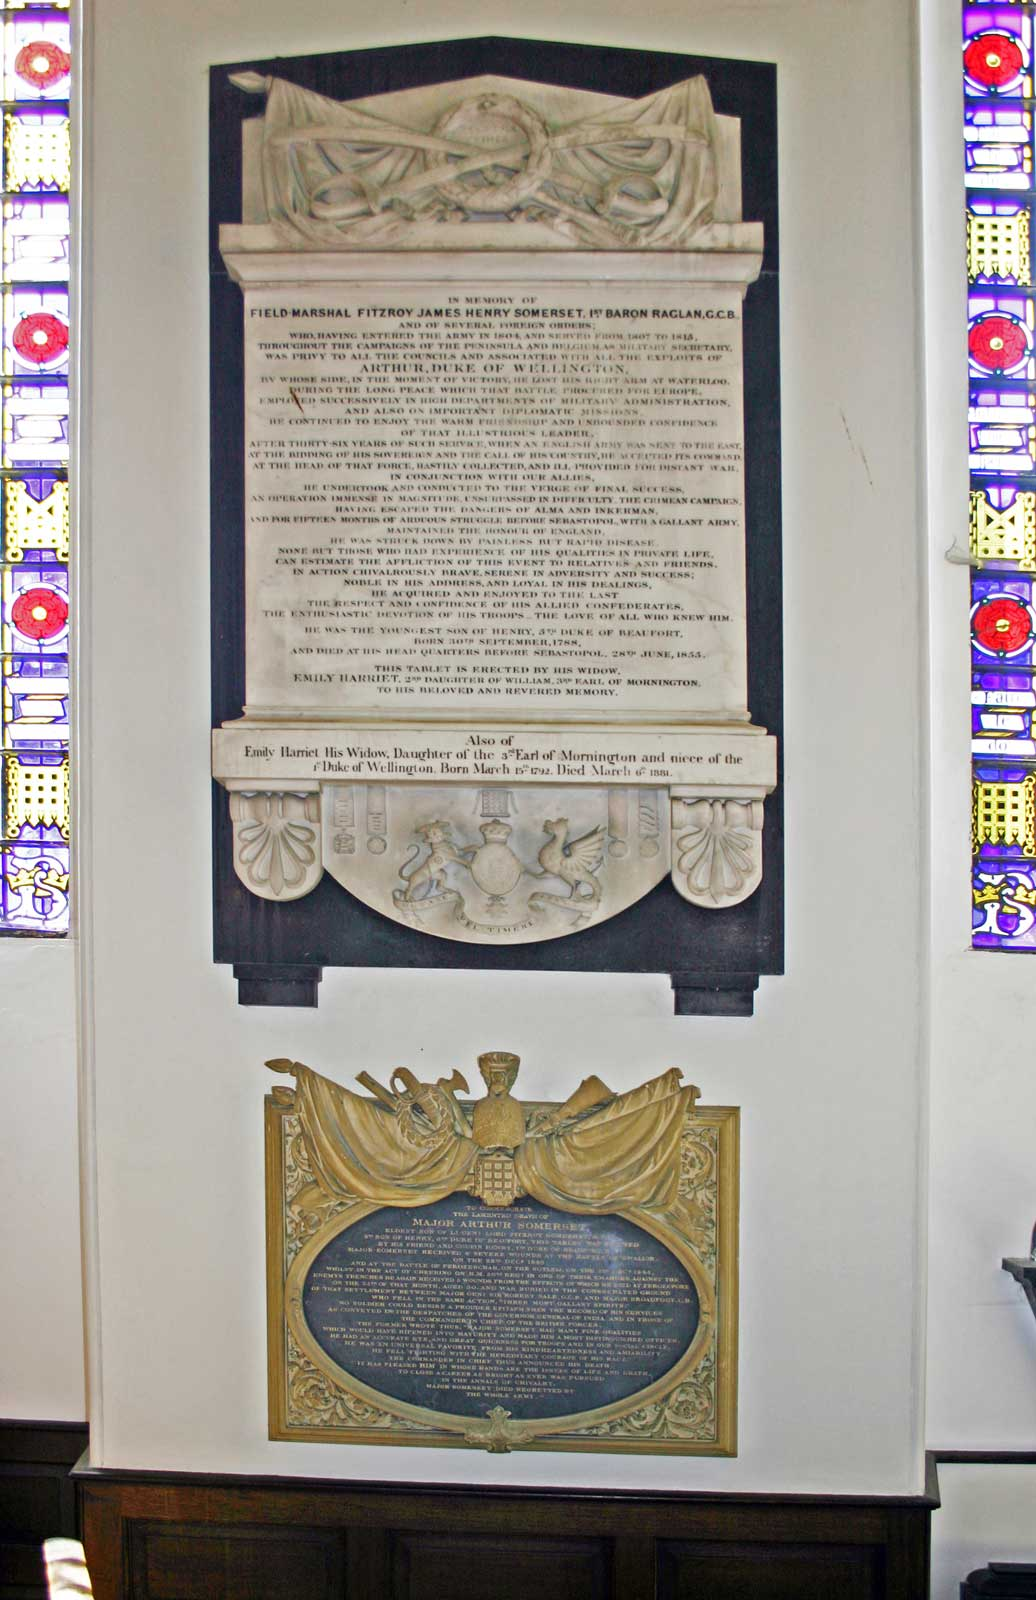 Memorial to Field Marshal Lord Raglan